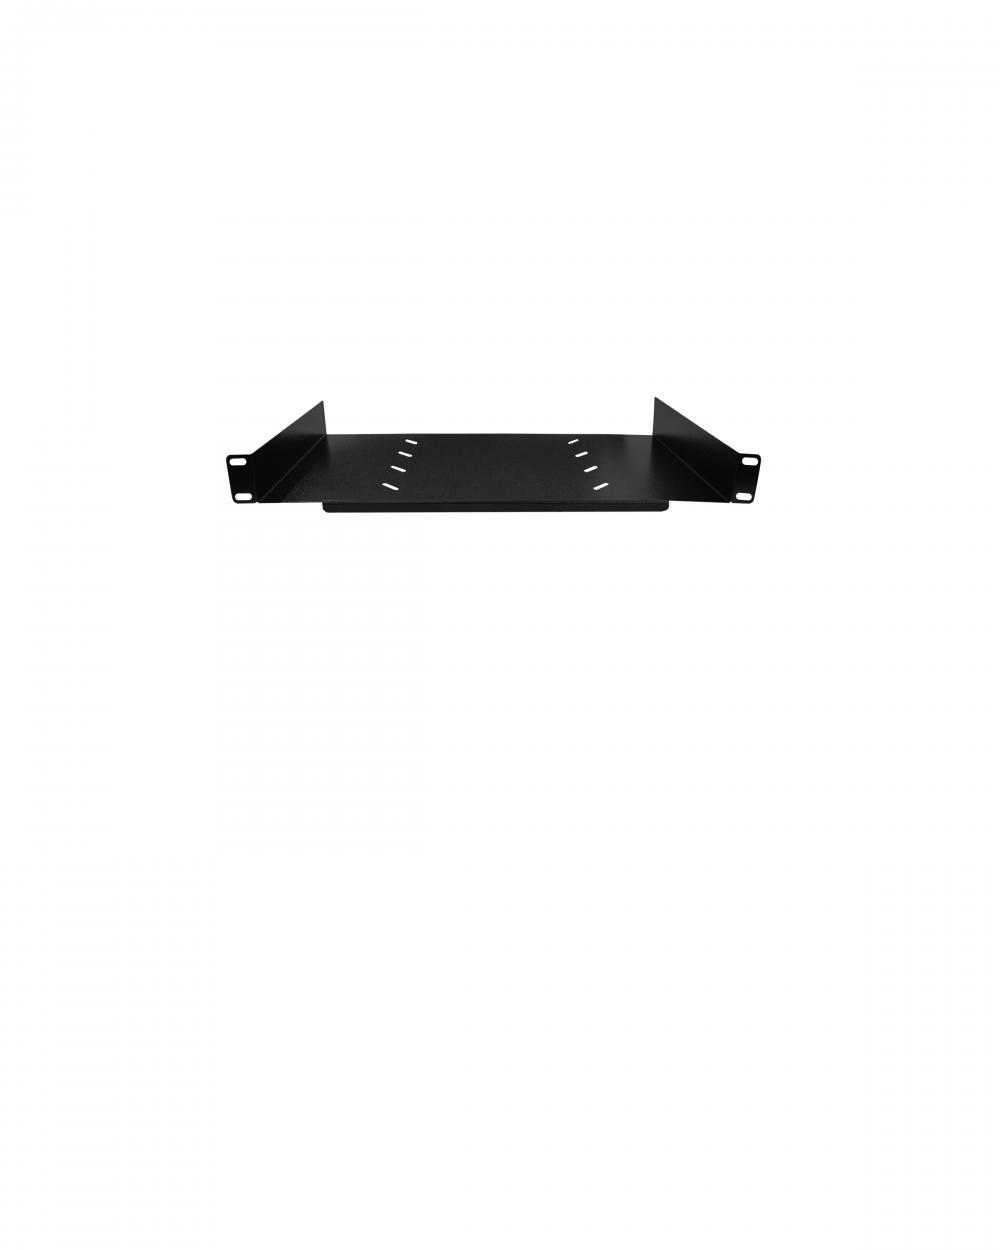 Bandeja Frontal Fixa Padrão 19'' 1U x 250mm